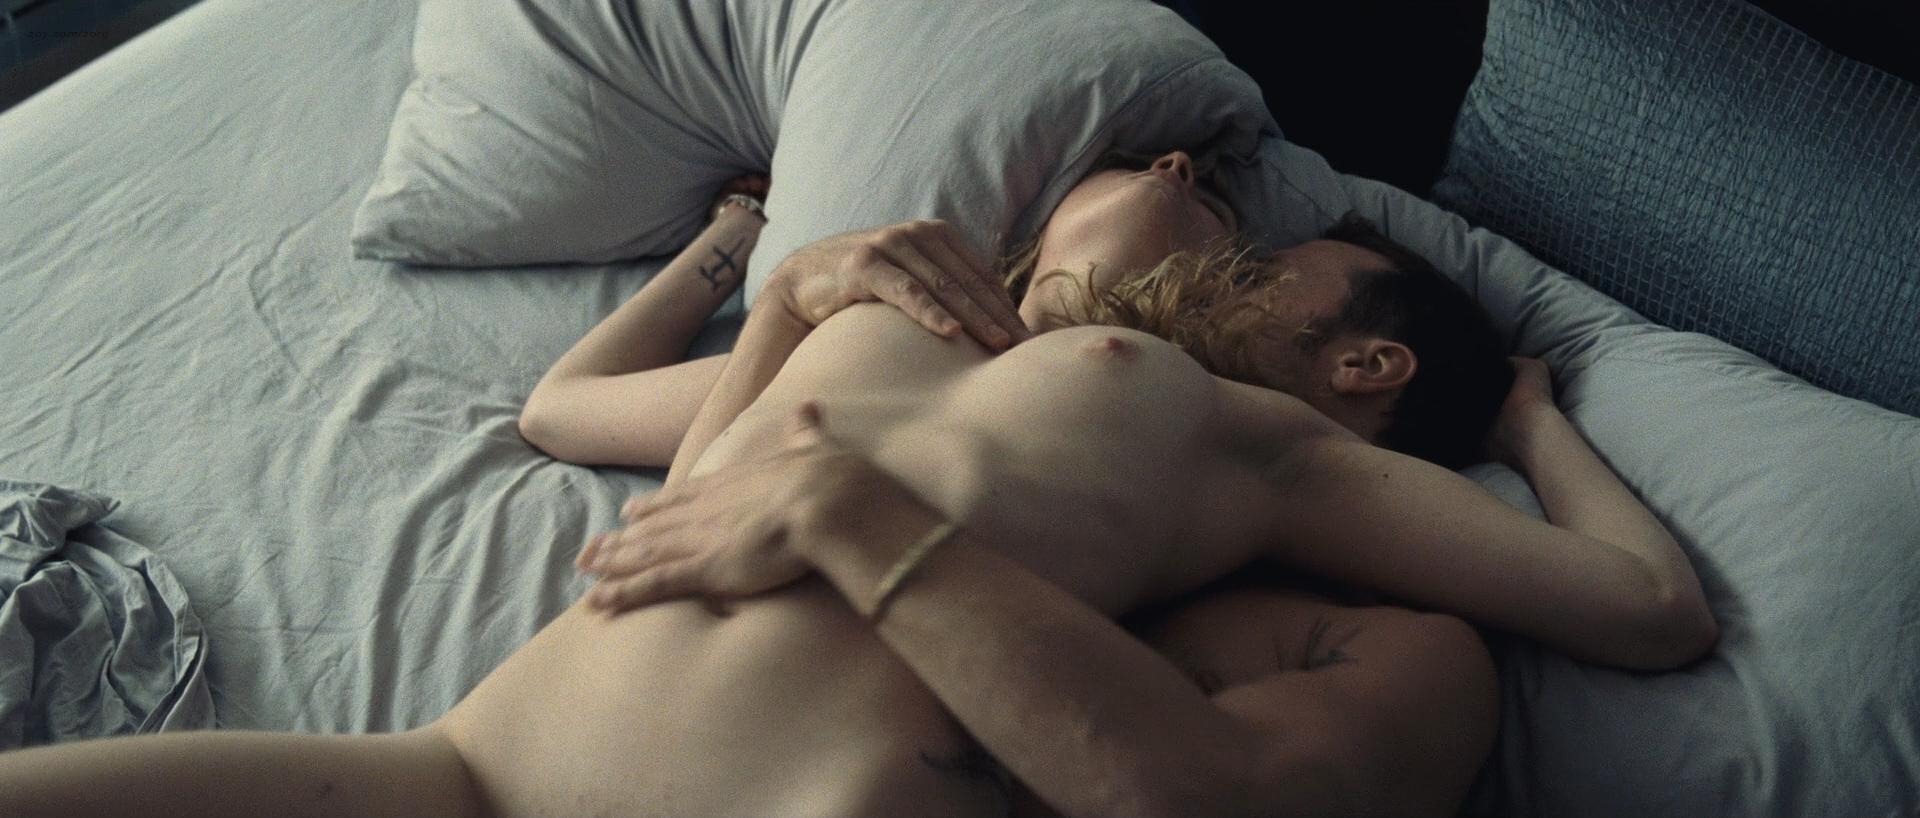 Evelyne Brochu nude bush and sex Hélène Florent nude brief topless - Café de Flore (FR-CA-2011) HD 1080p BluRay (20)